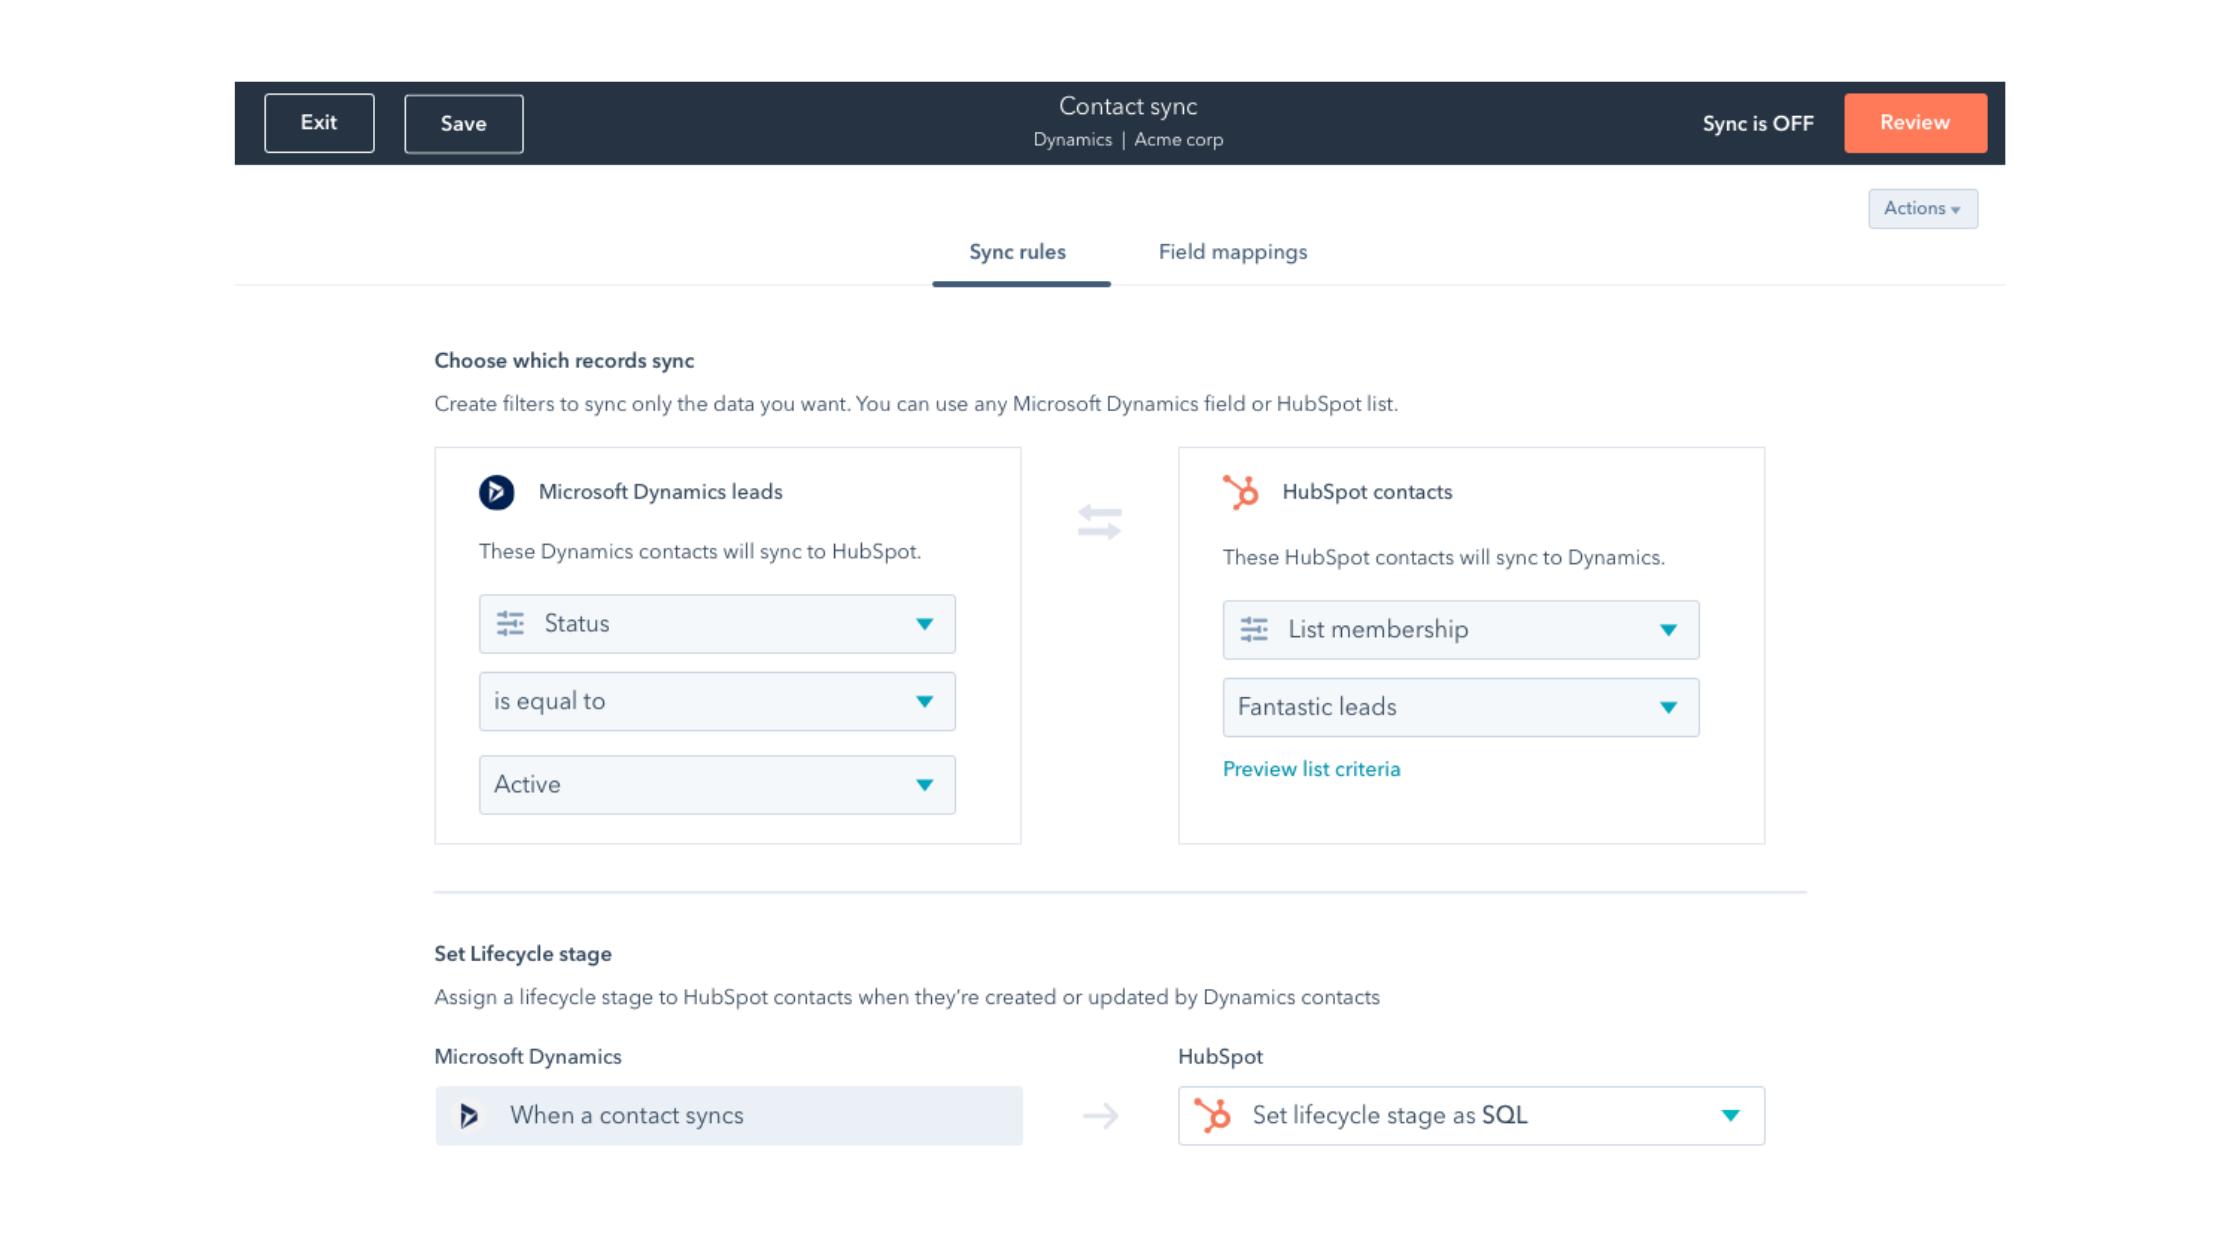 Sync & Clean Customer Data